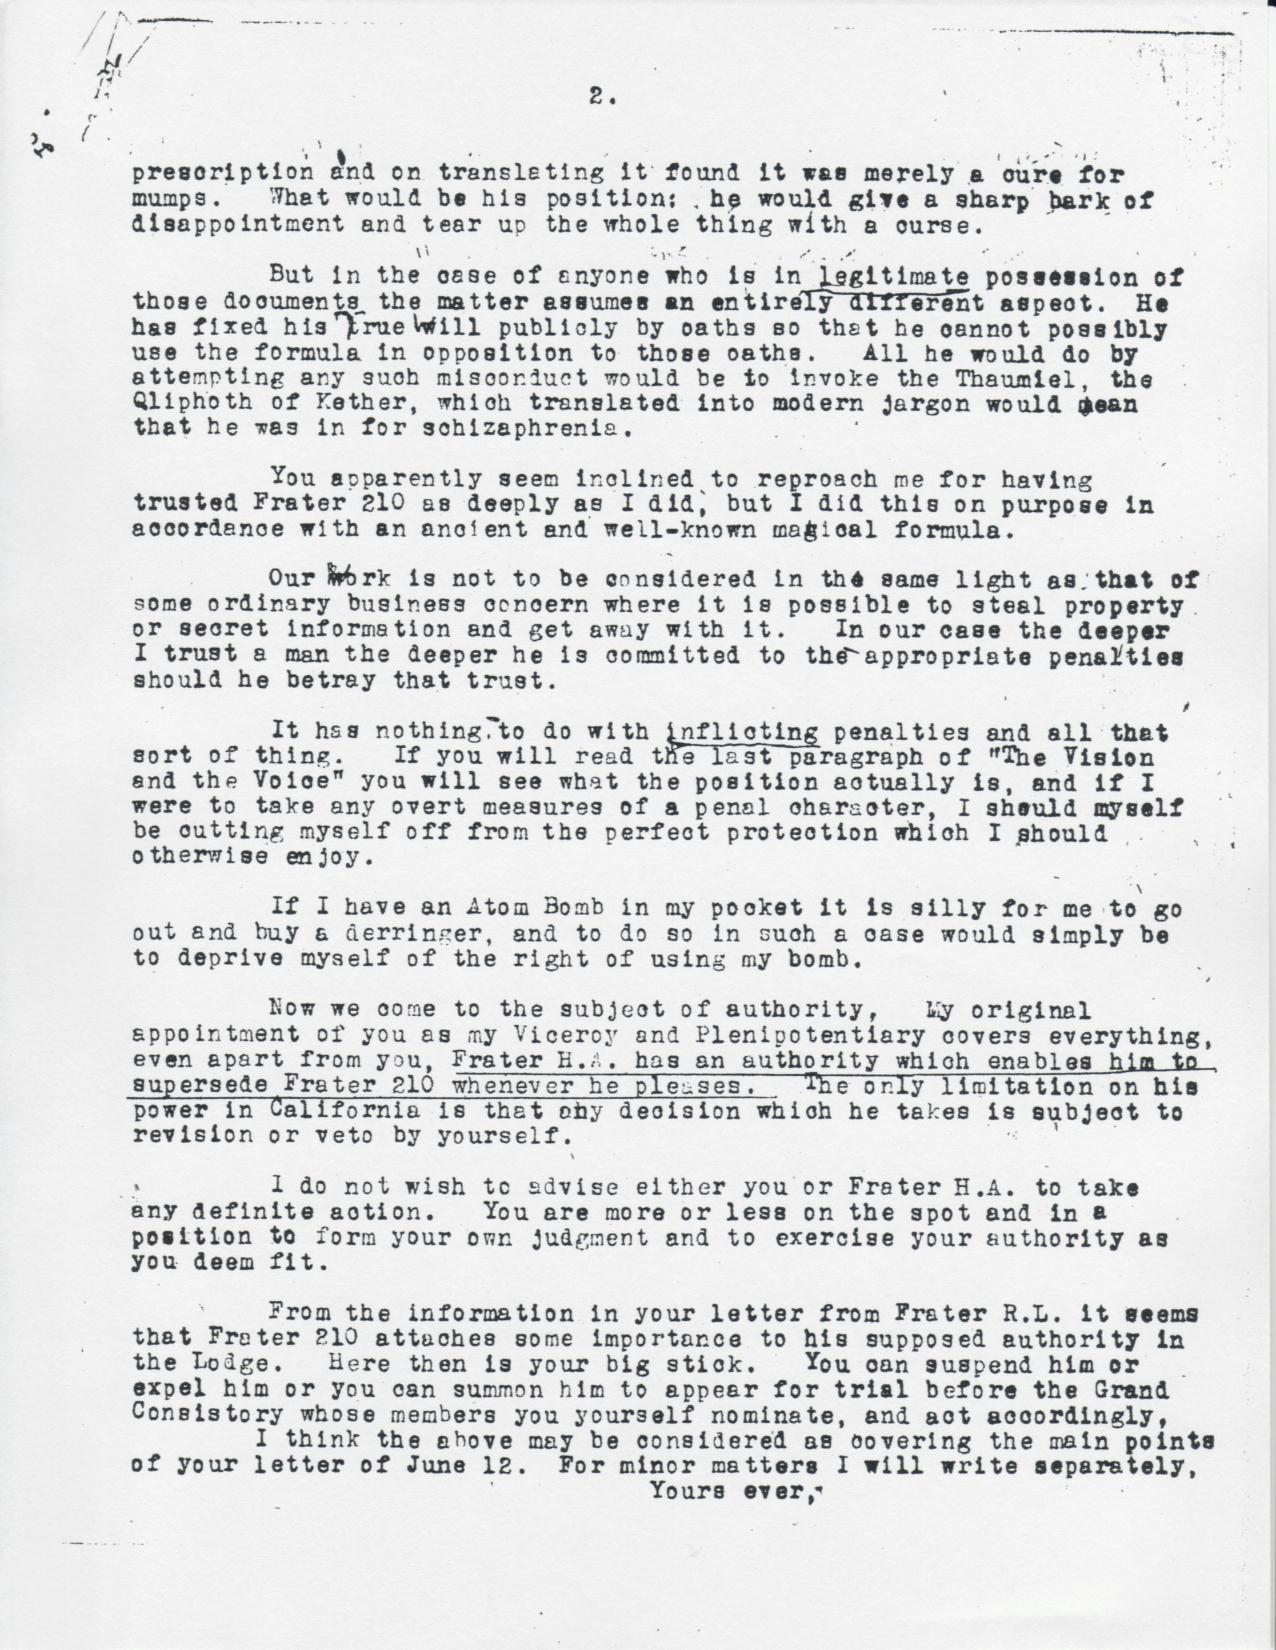 grady mcmurtry to karl germer the grady mcmurtry project 06 19 1946 grady mcmurtry to karl germer pg 2